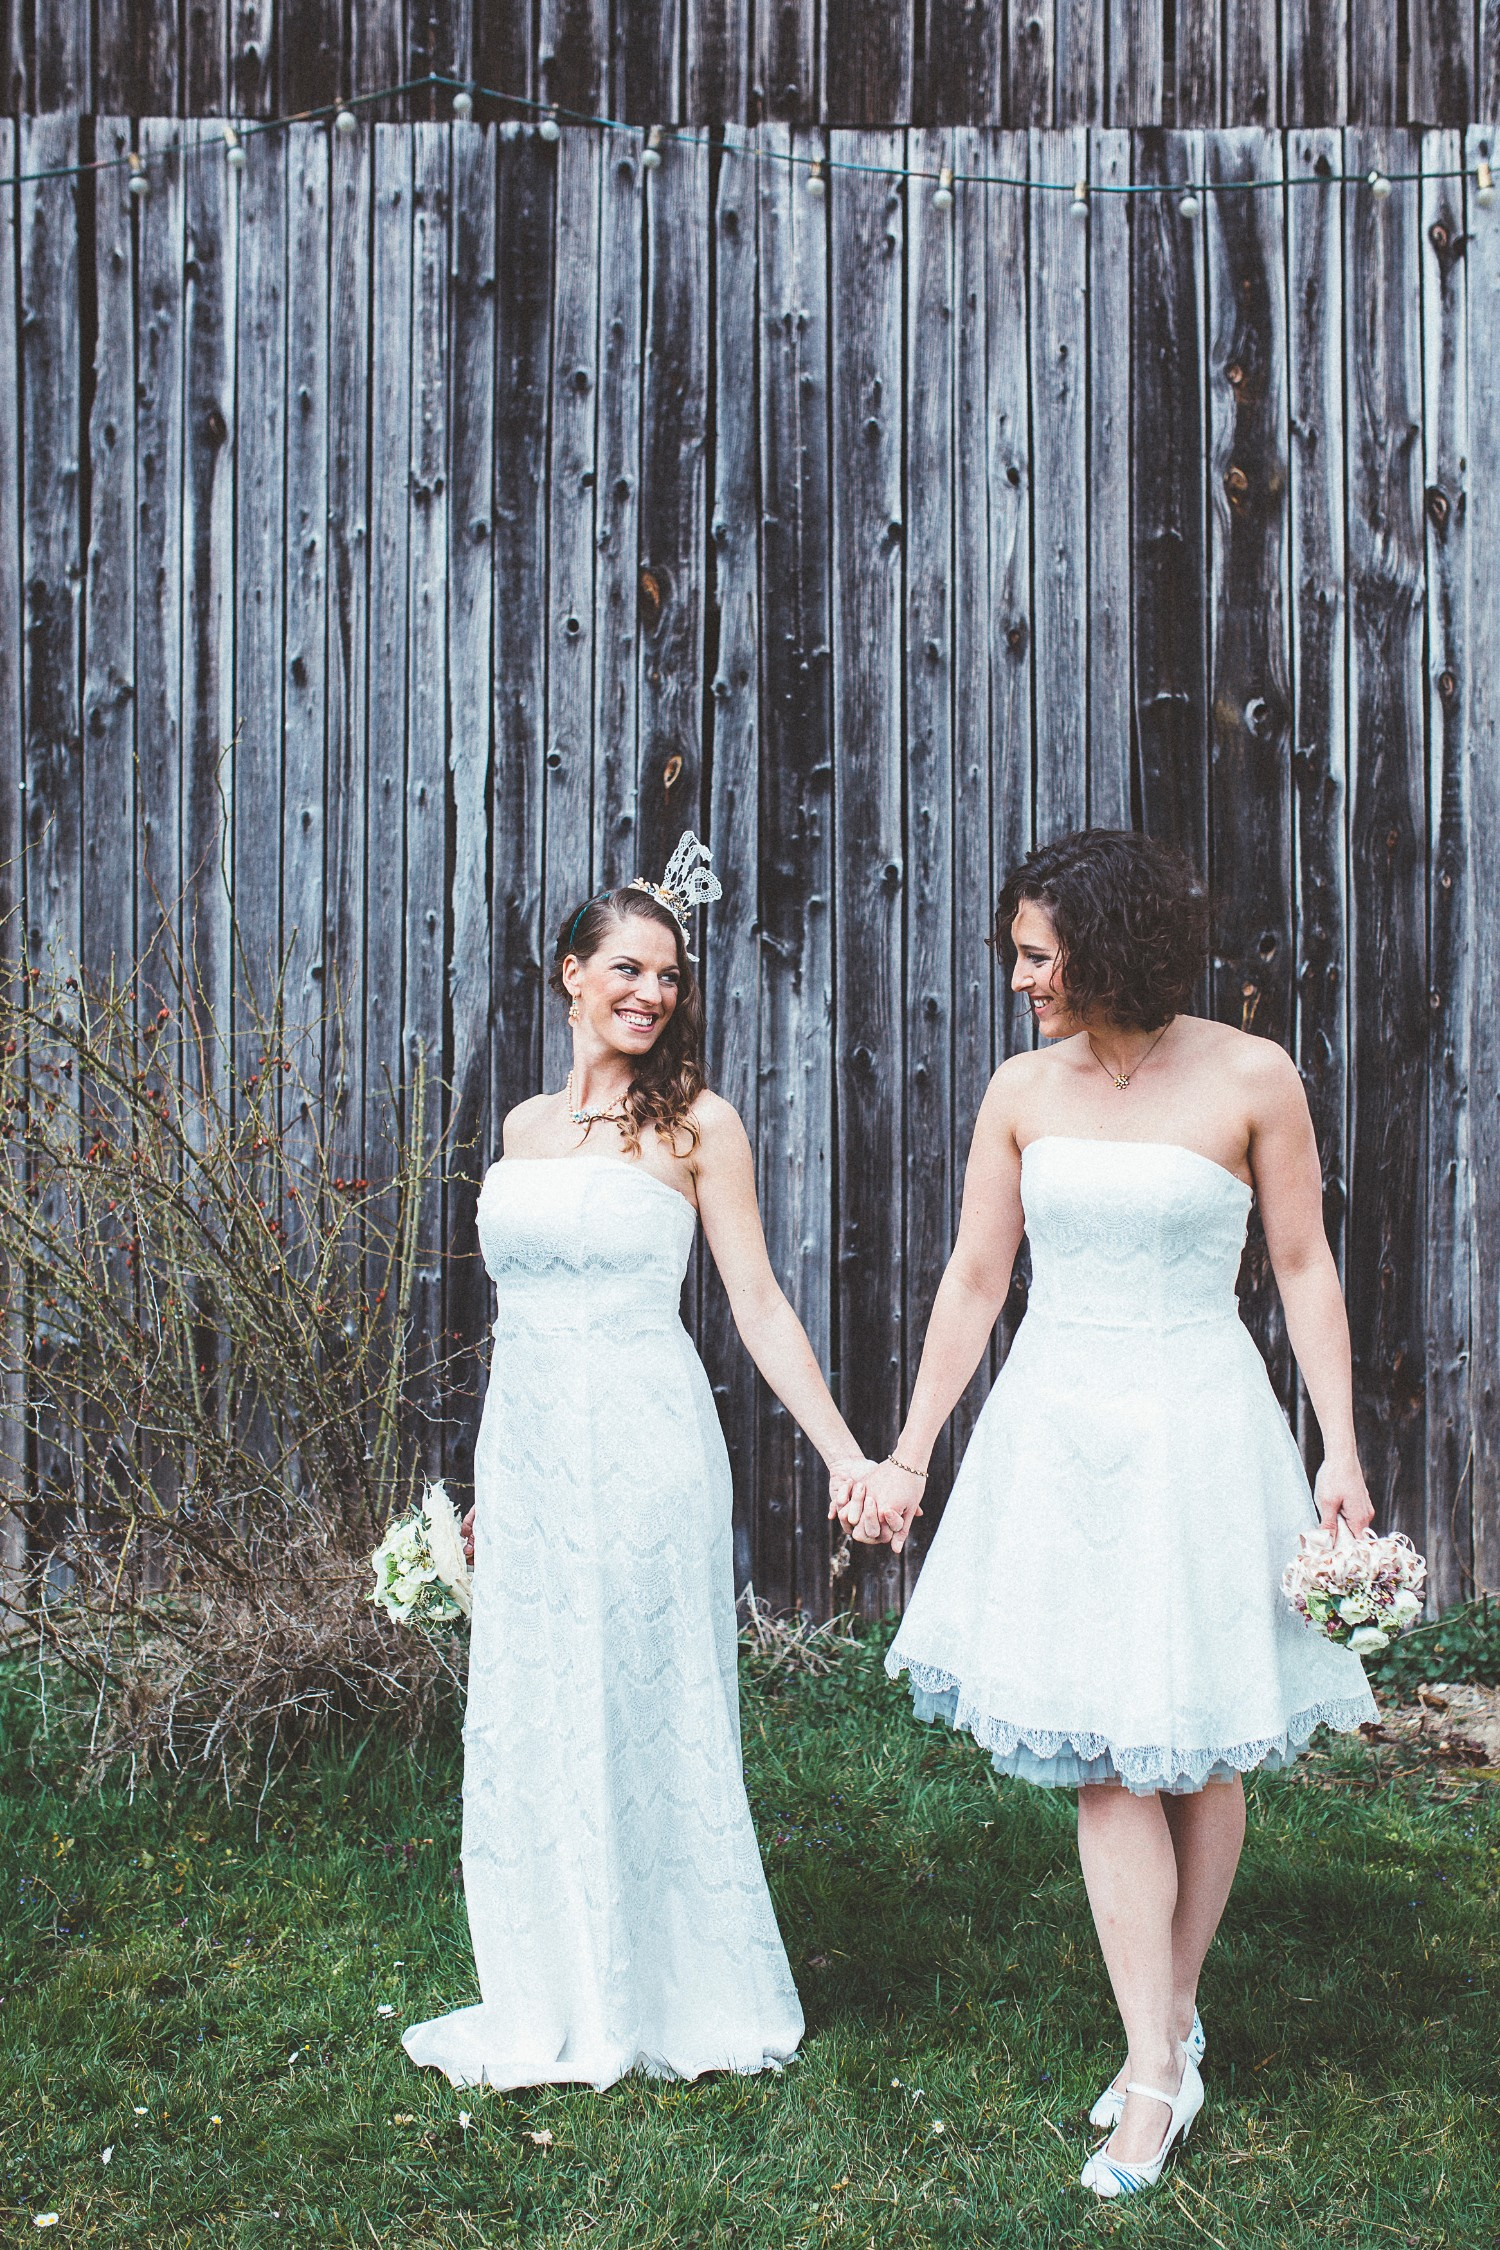 Alice in Wonderland themed same sex wedding styled shoot LGBT Graz Styria Austria